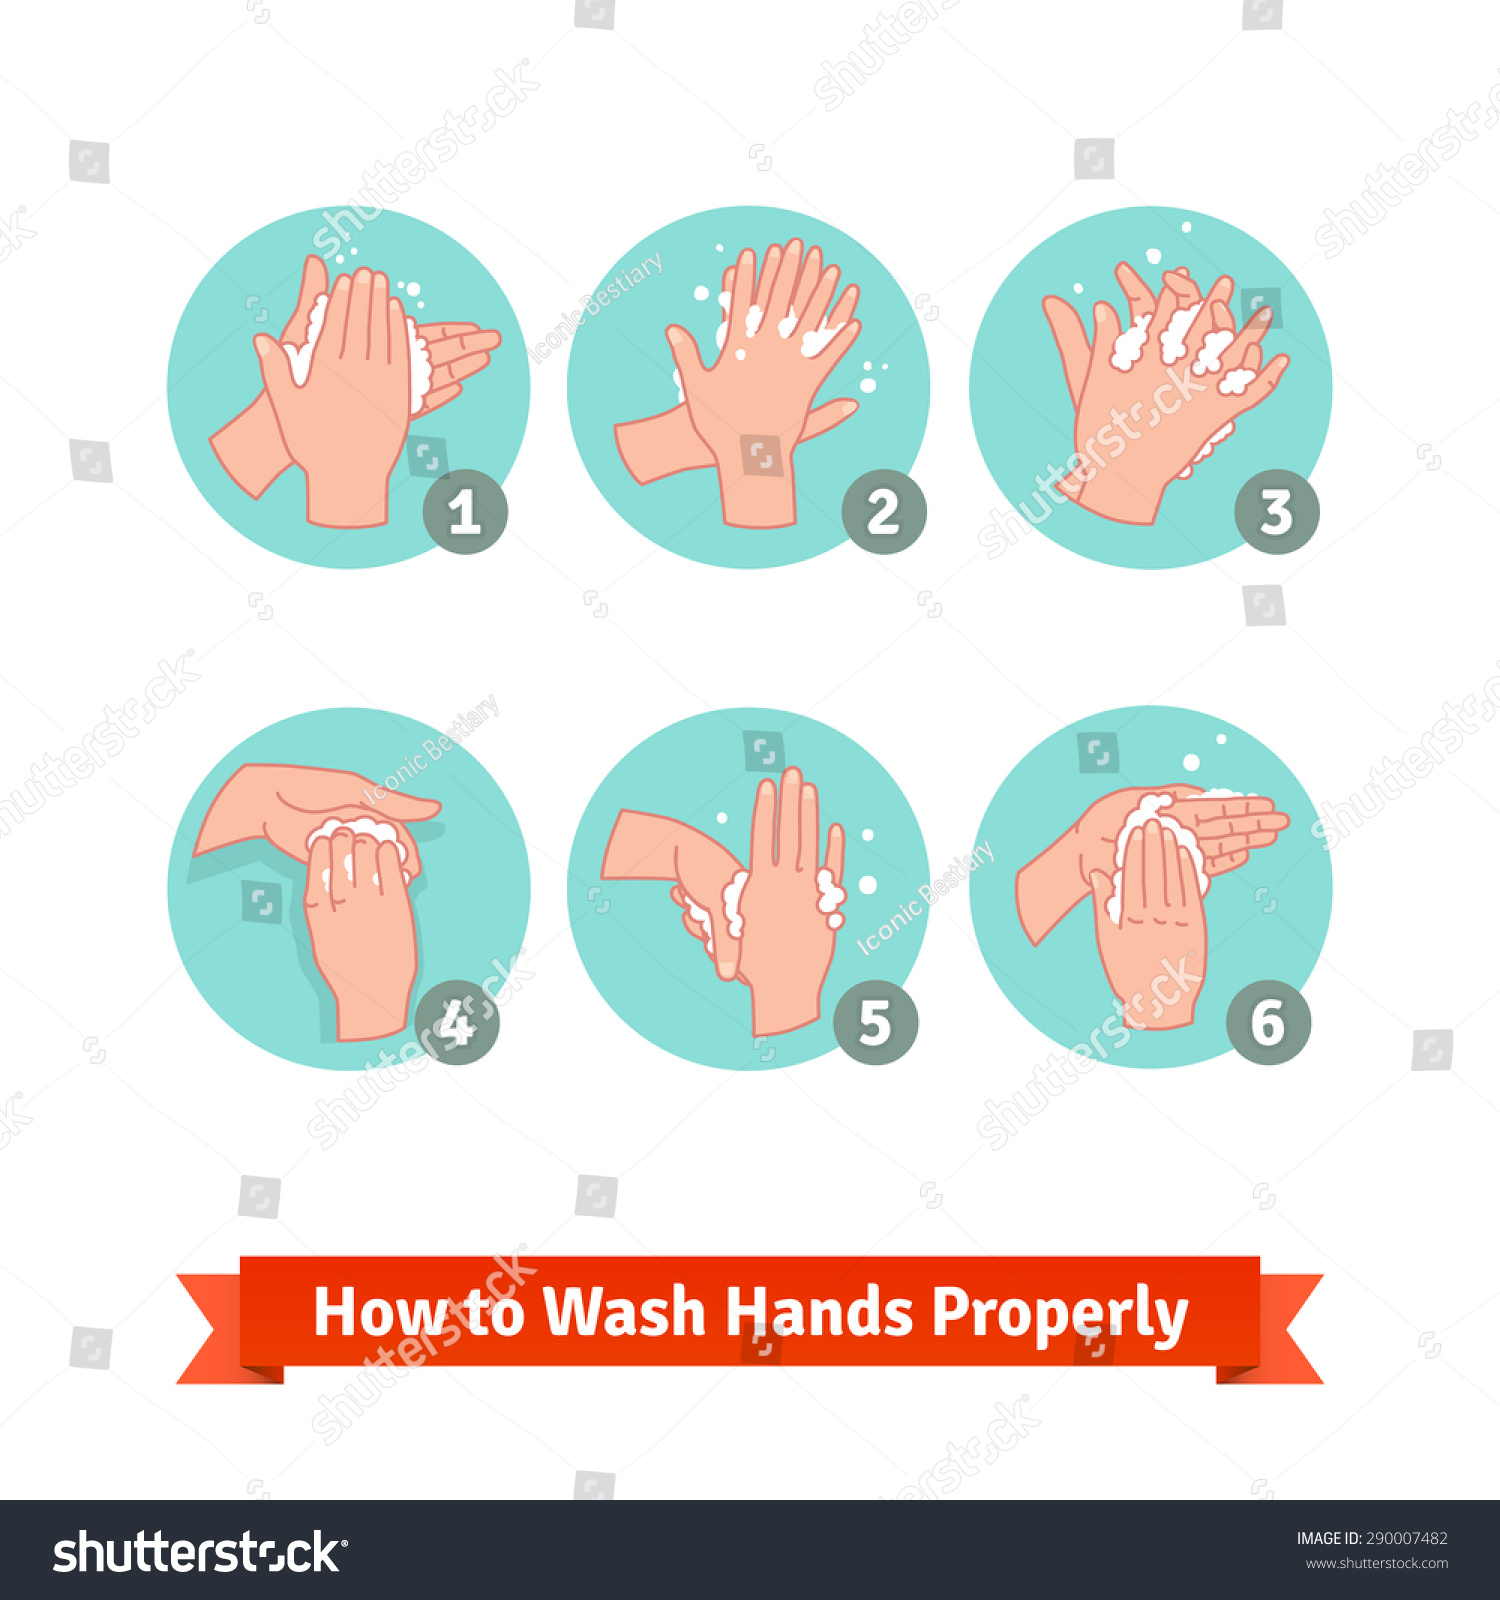 Online Image & Photo Editor  Shutterstock Editor # Wasbak Handwas_073641